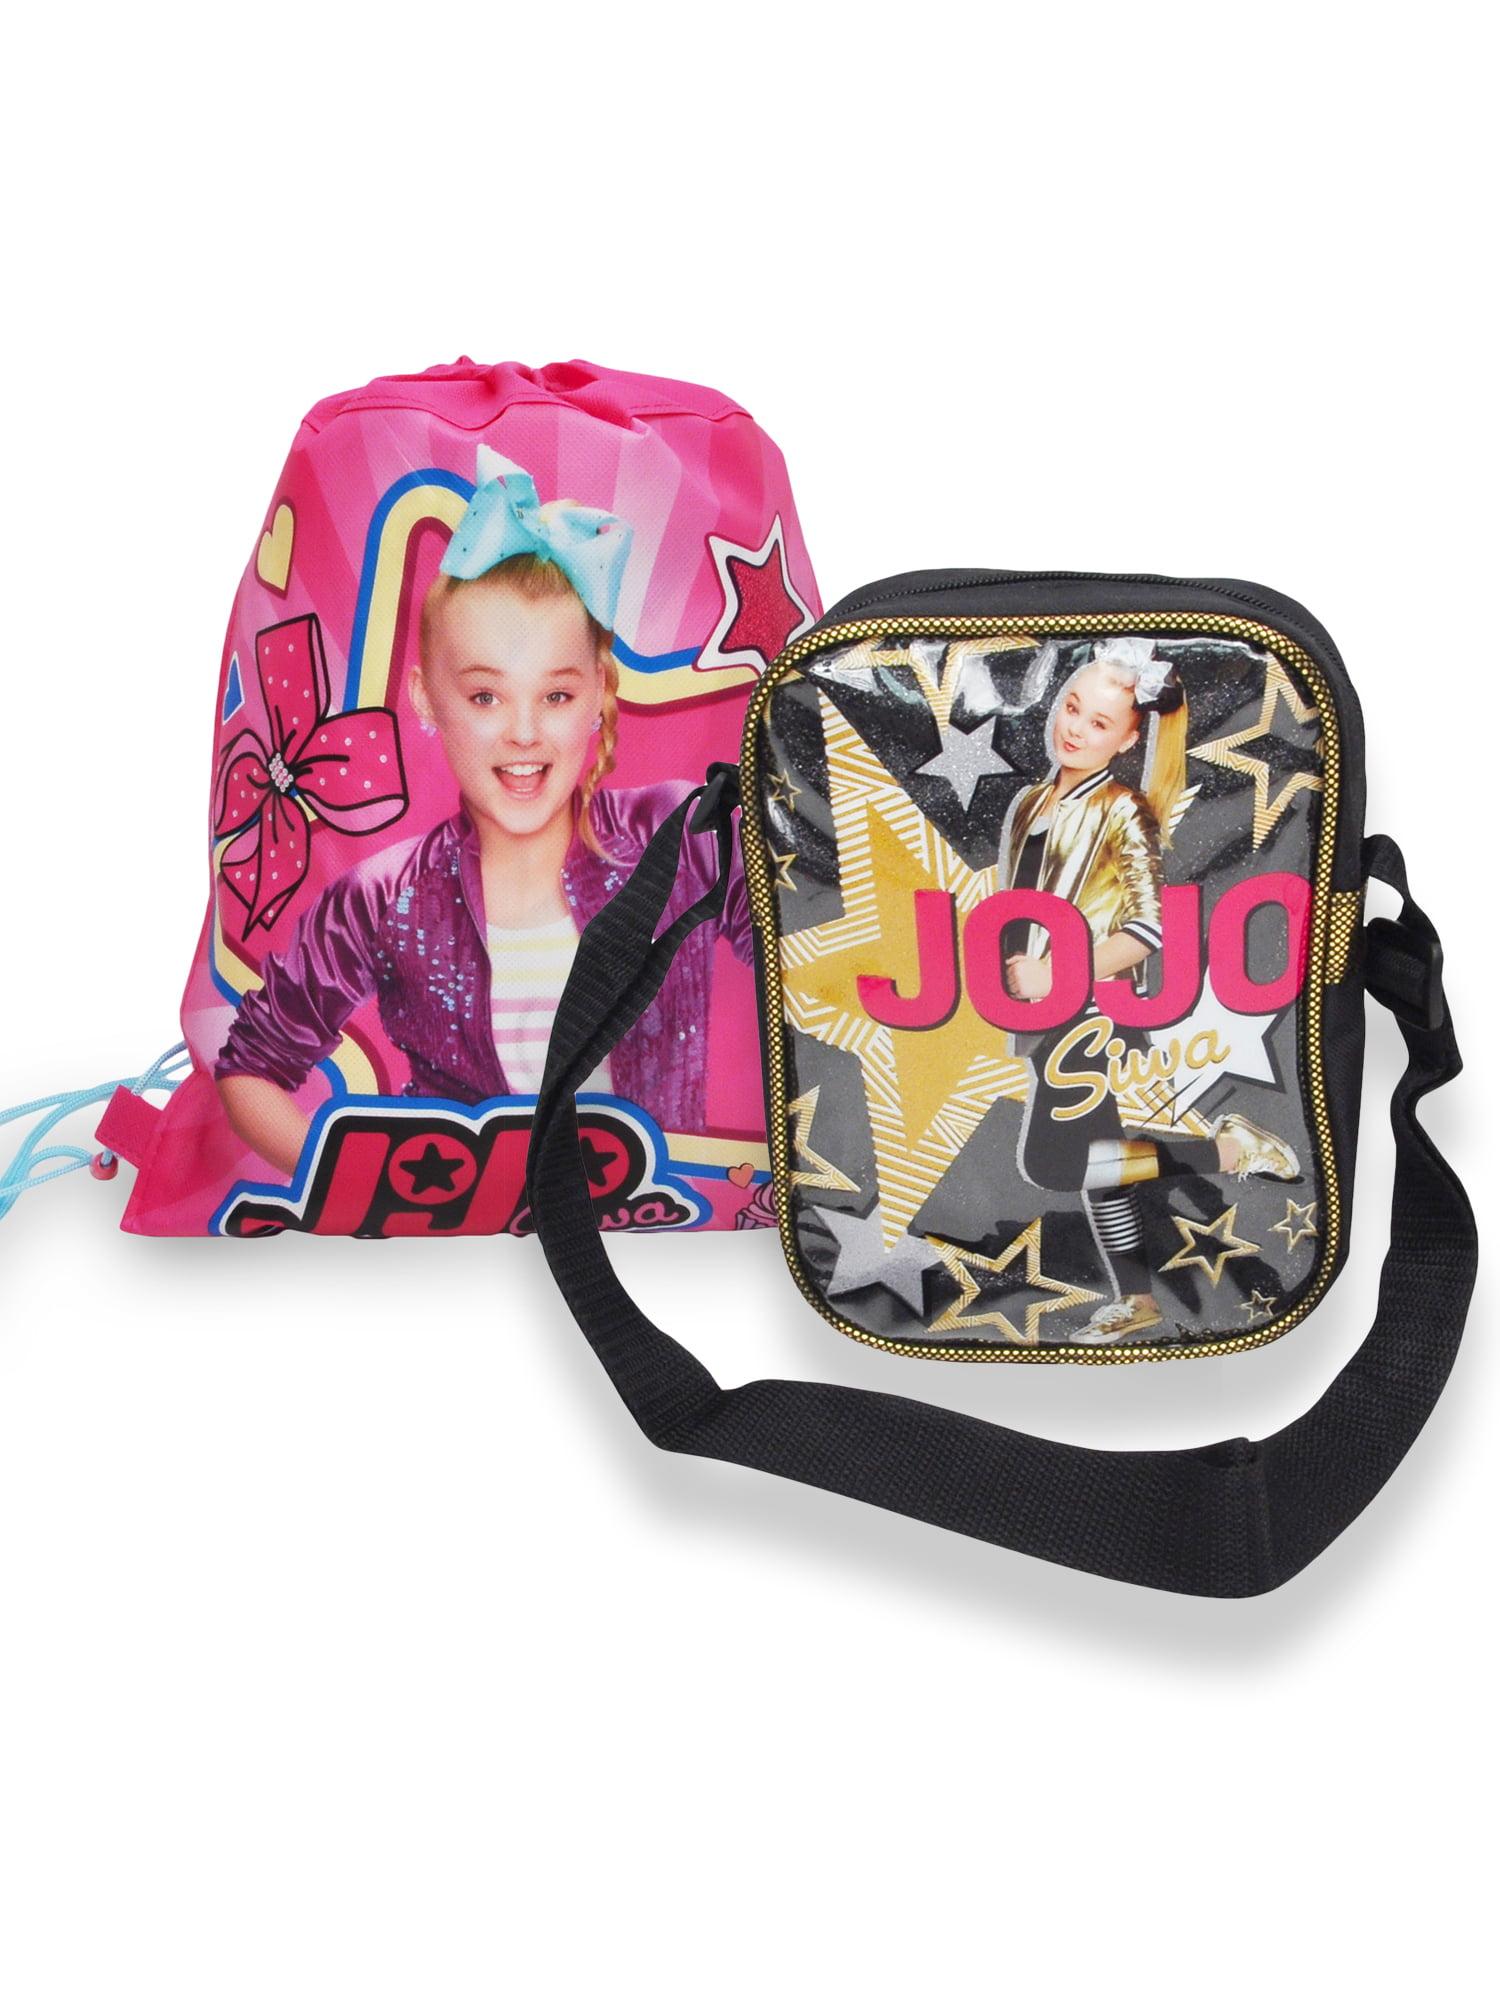 Girls JoJo Siwa Crossbody Shoulder Bag & Slingbag 2-Piece